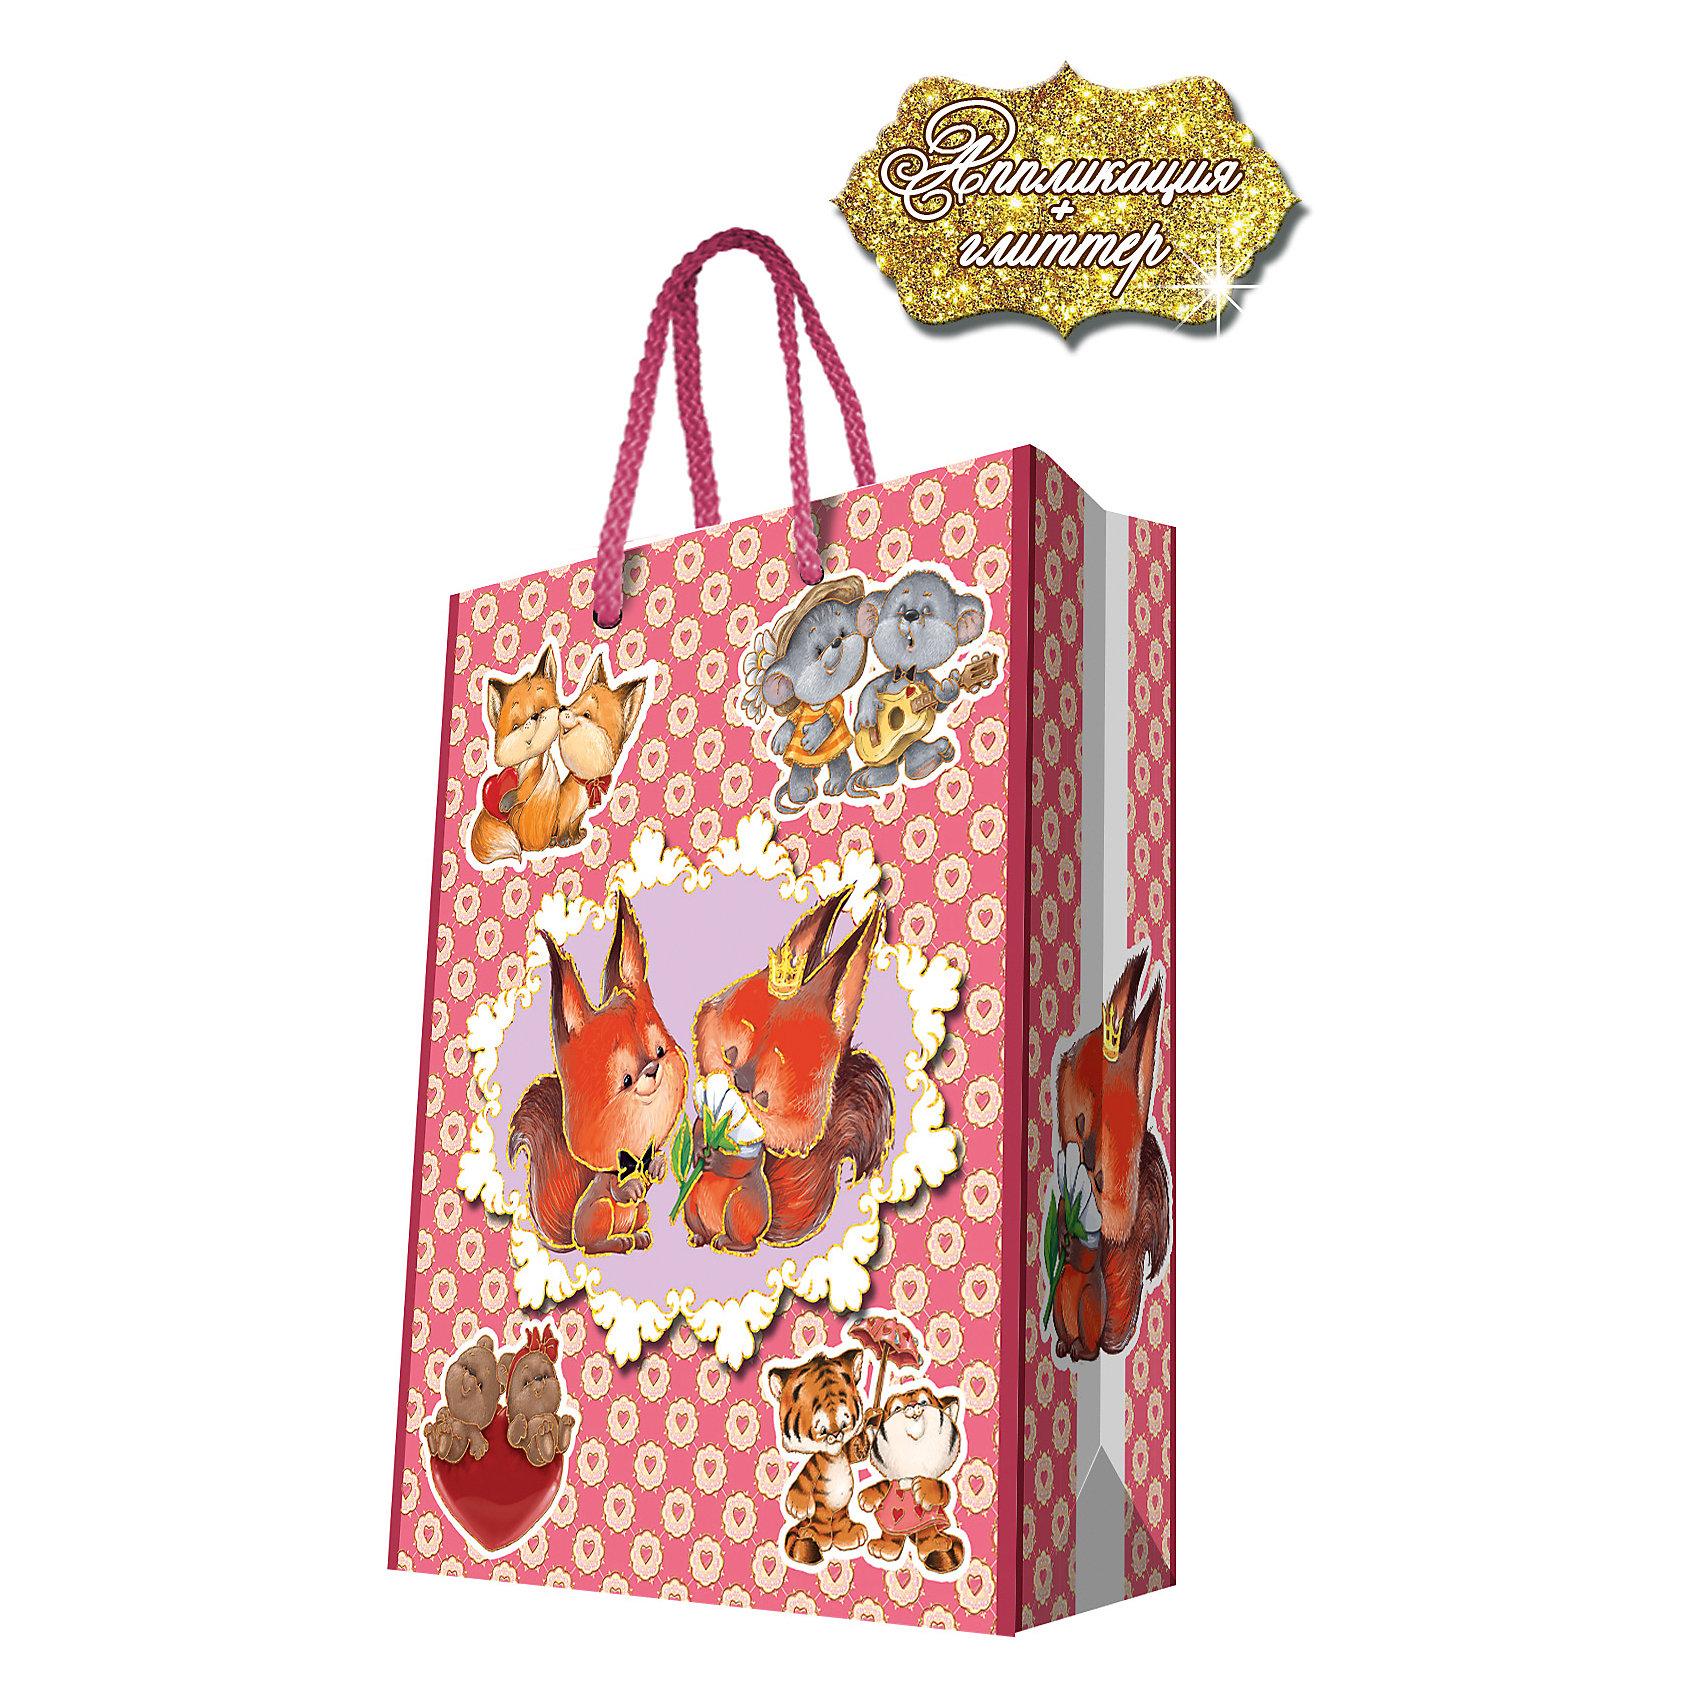 Феникс-Презент Подарочный пакет Зверята 26*32,4*12,7 см magic time подарочный пакет новогодняя лампа 26 32 4 12 7 см